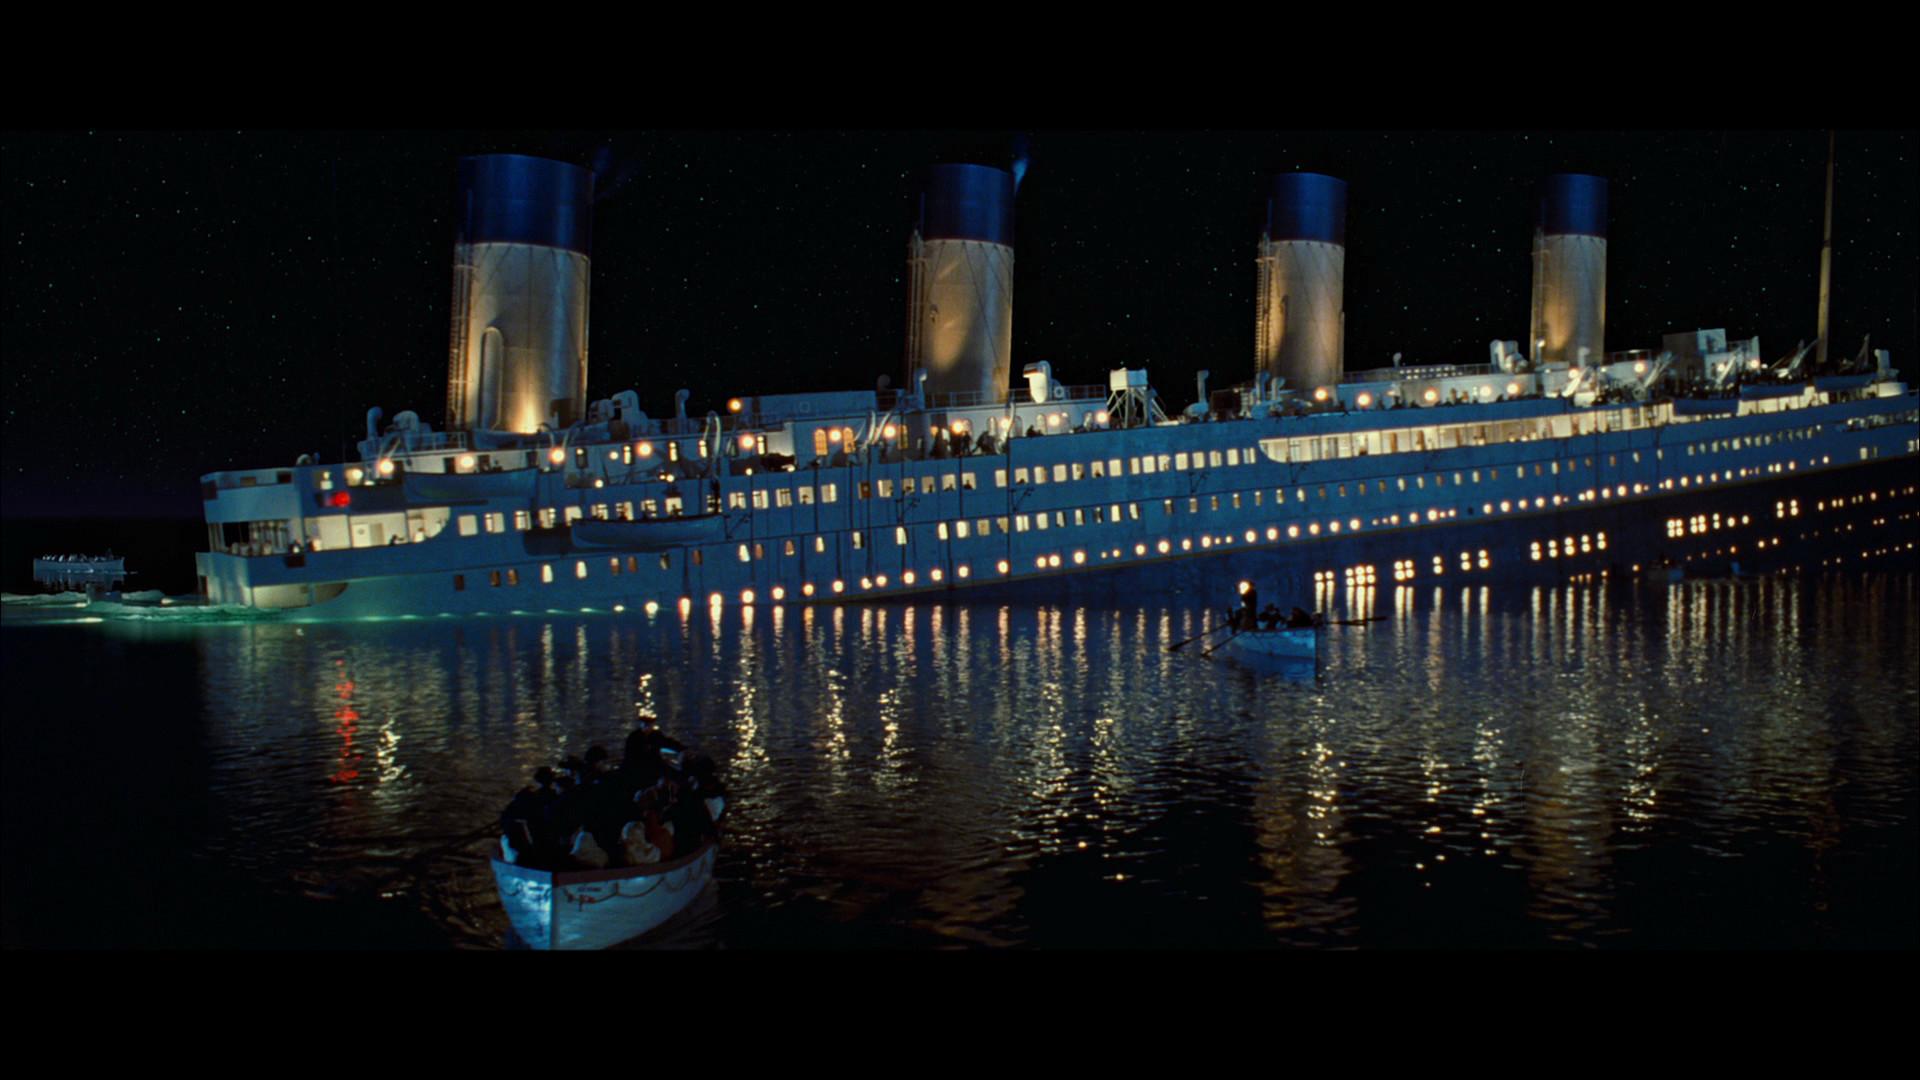 Titanic Sinking Wallpaper 59 Images